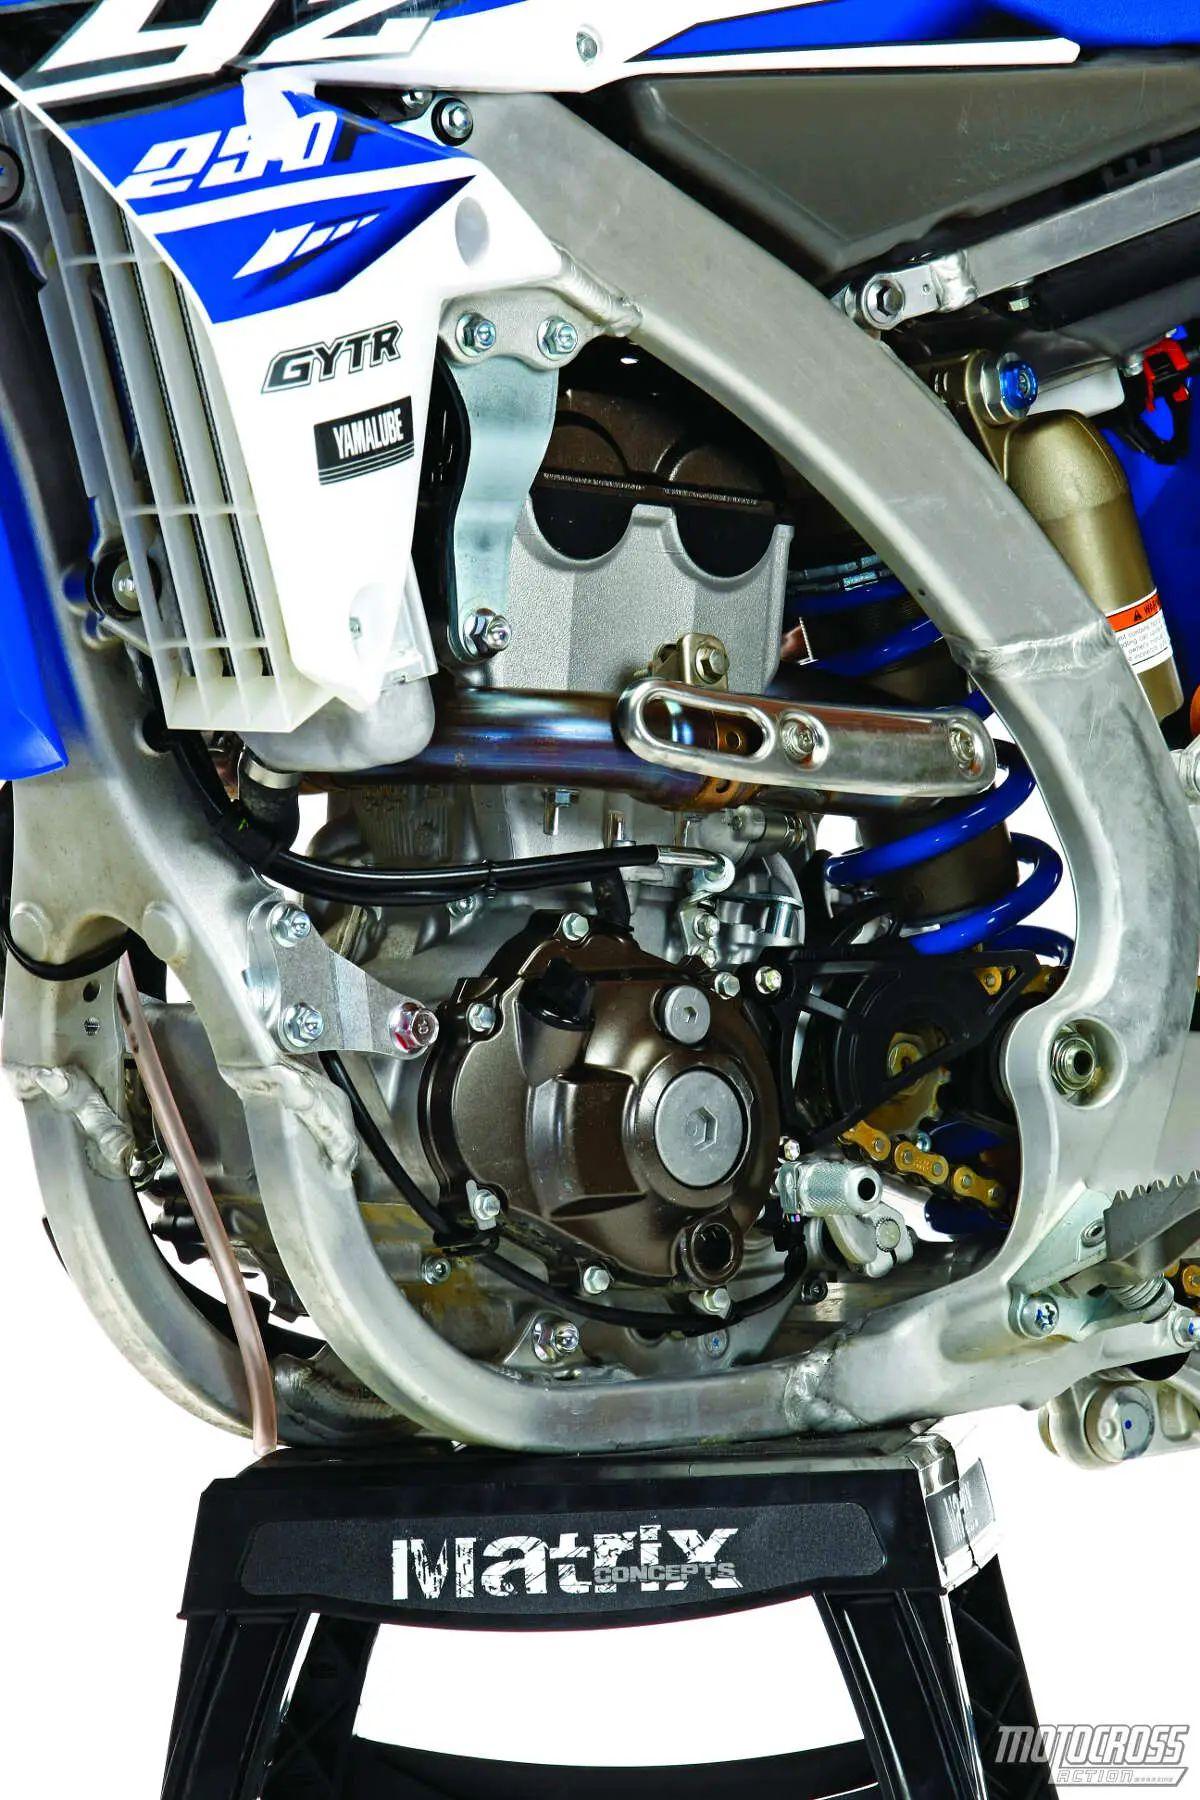 2007 yamaha yz250f engine diagram